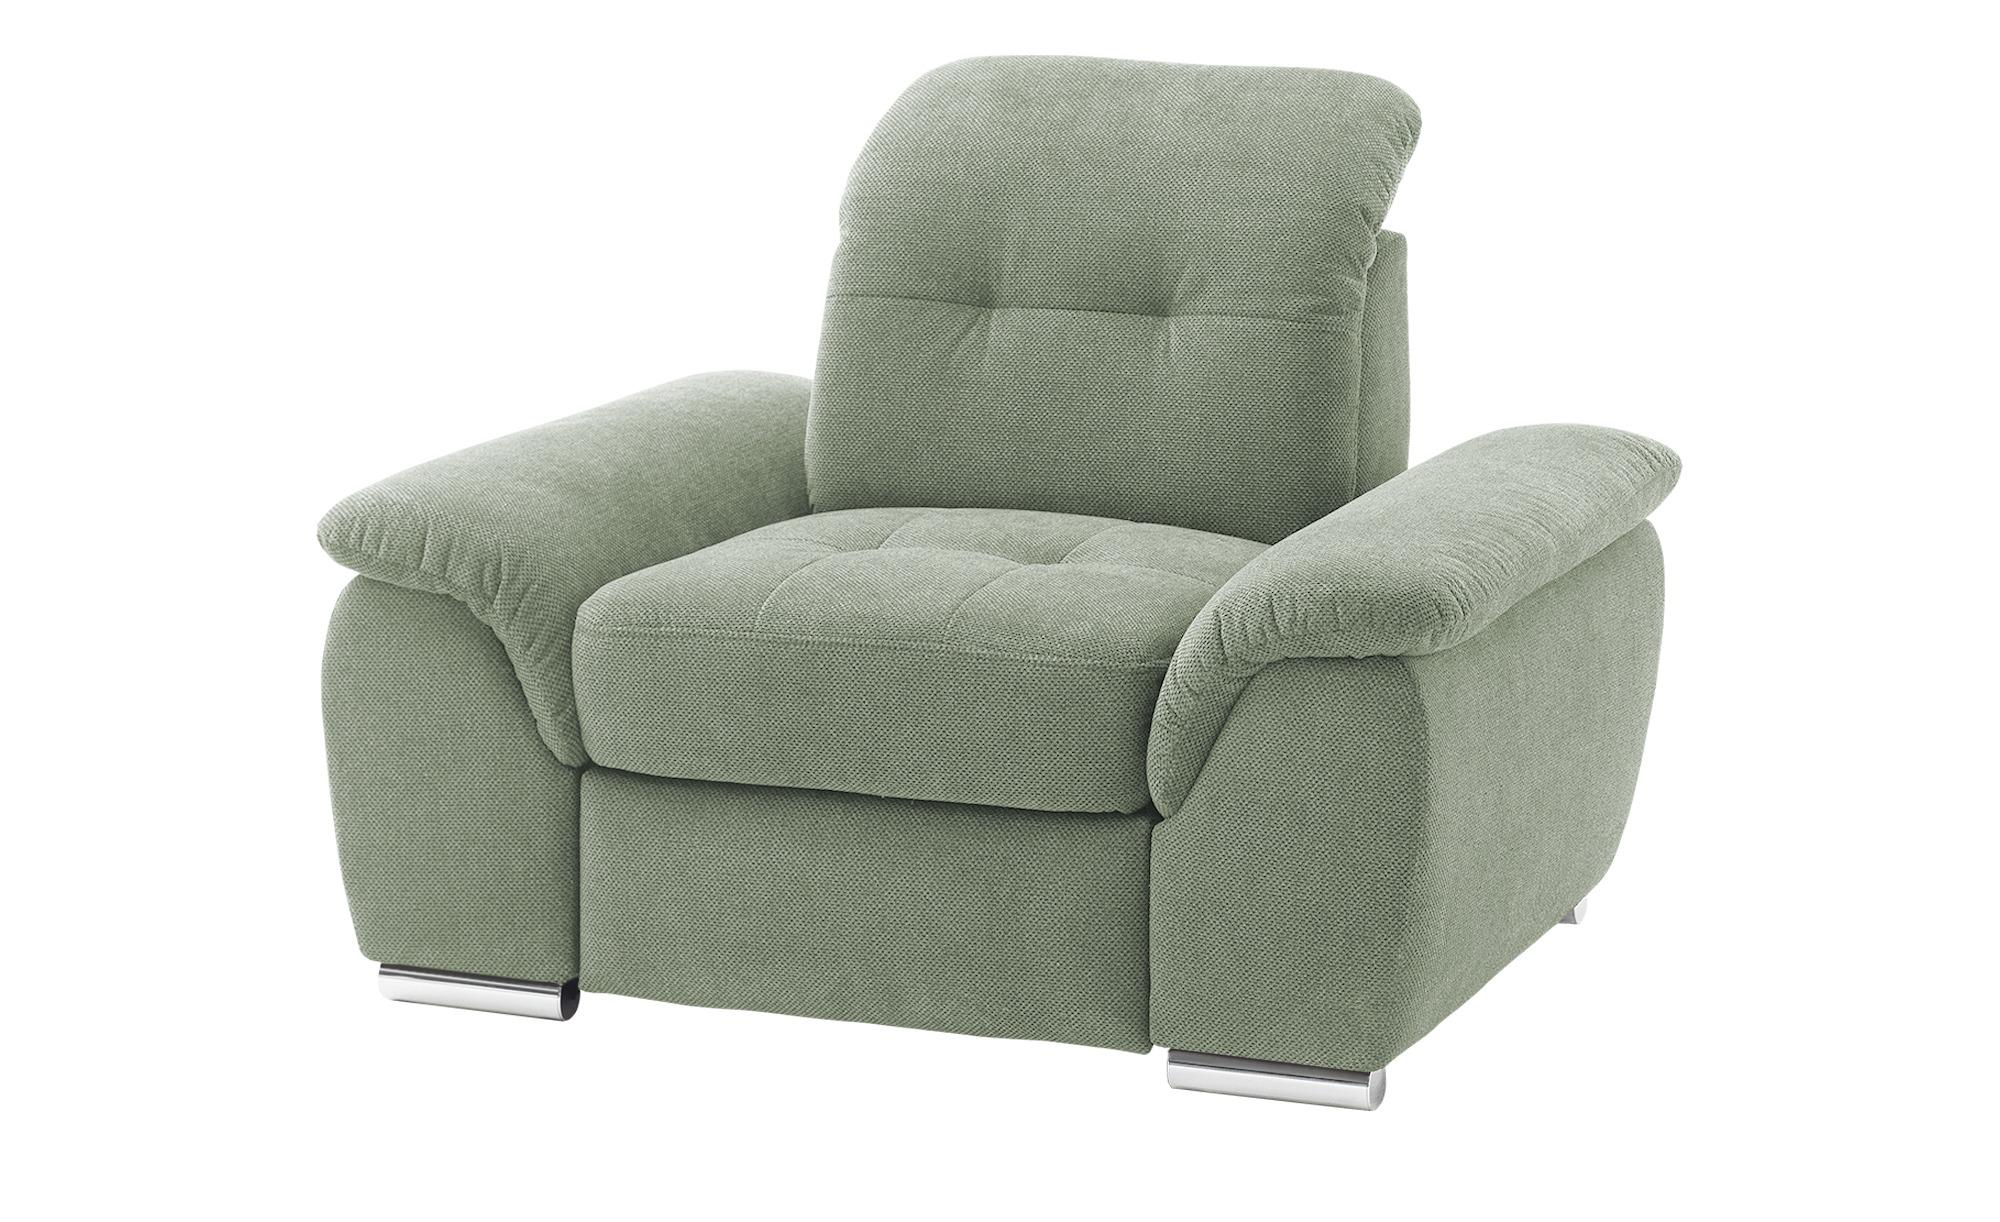 Sessel   Halona ¦ grün ¦ Maße (cm): B: 116 H: 89 T: 109 Polstermöbel > Sessel > Polstersessel - Höffner